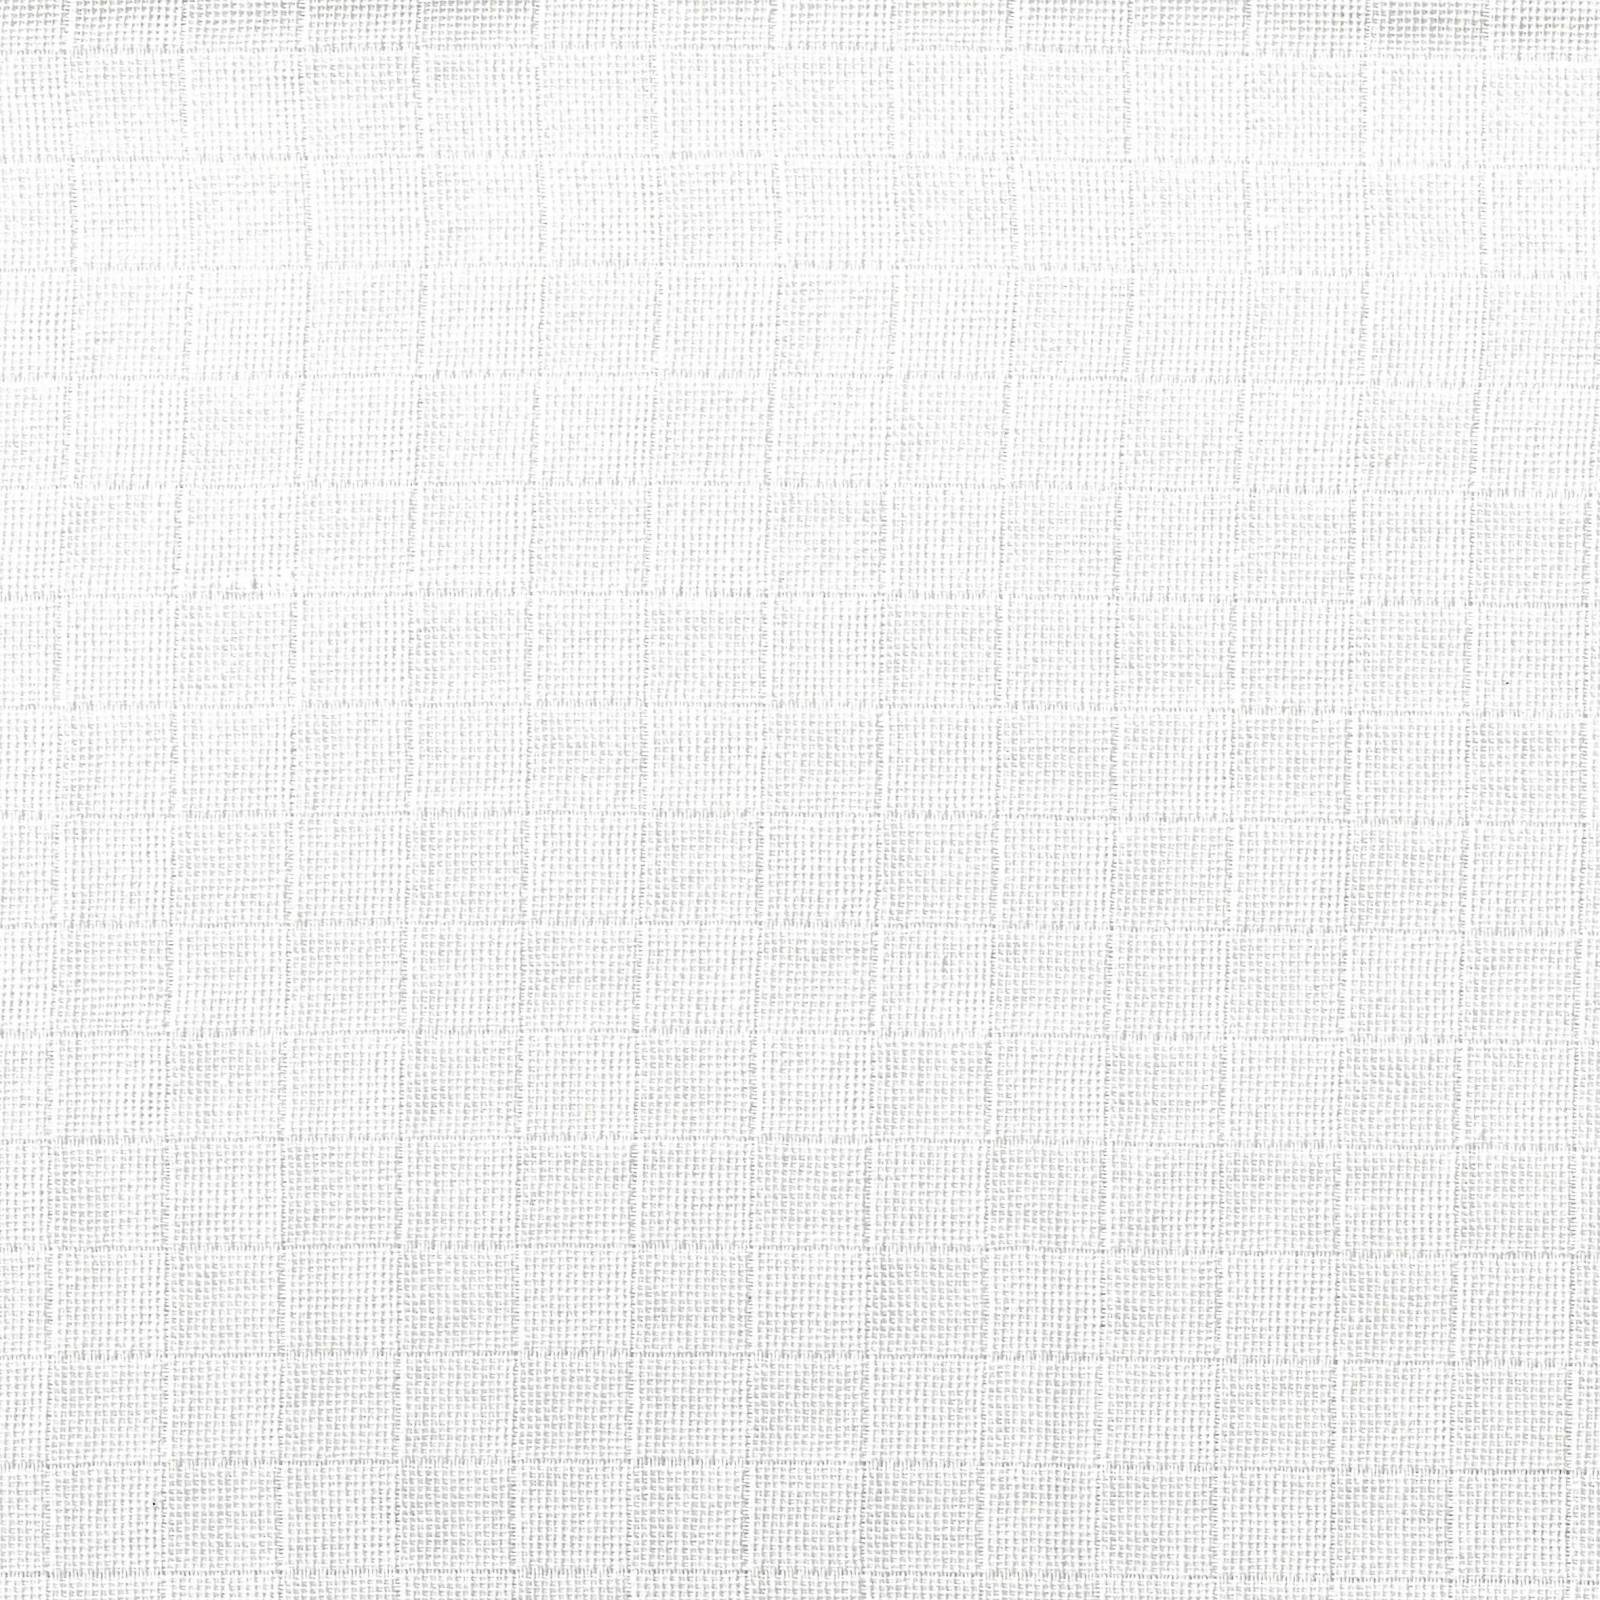 Fralda por metro quadriculada Mabber cor branca Ref. FM01 - Armarinhos Nodari